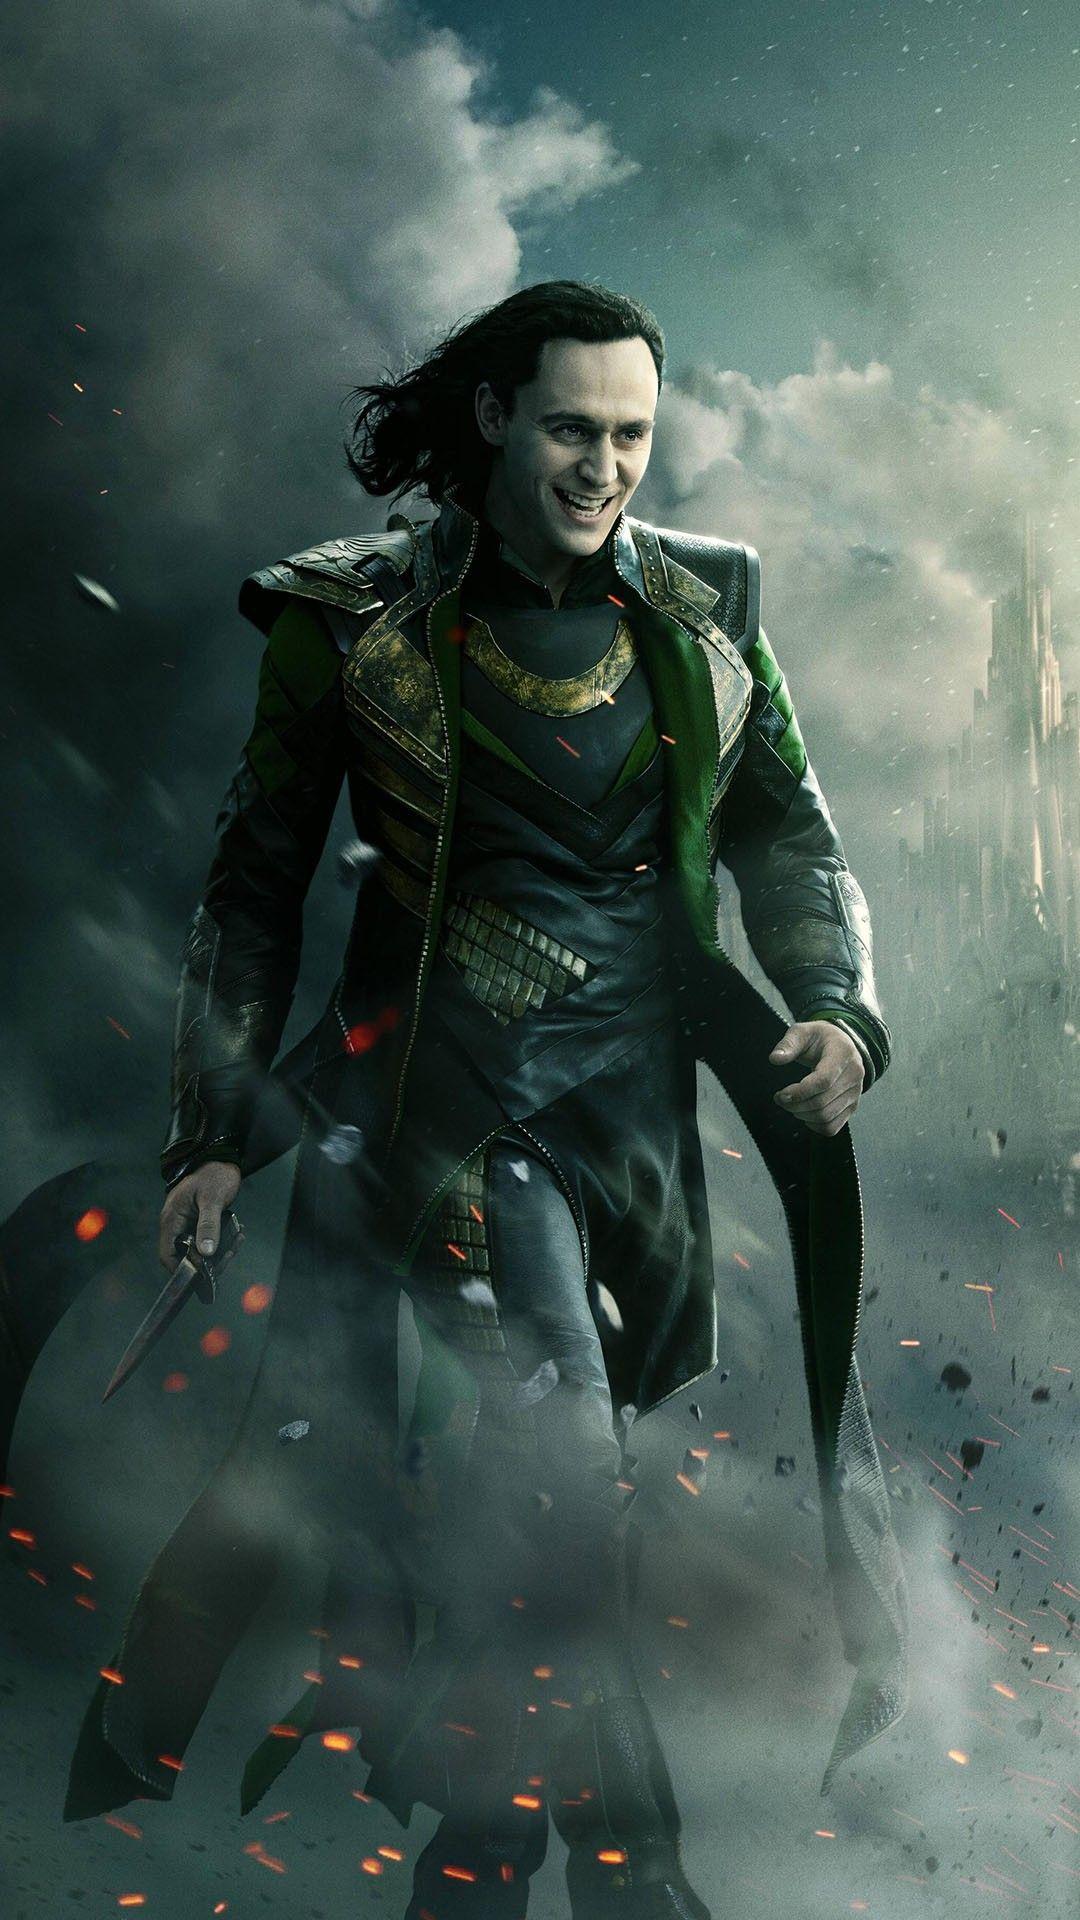 Thor Ragnarok Loki Wallpaper Hd Loki Hd Wallpaper Loki Poster Loki Wallpaper Loki Marvel loki wallpaper loki marvel